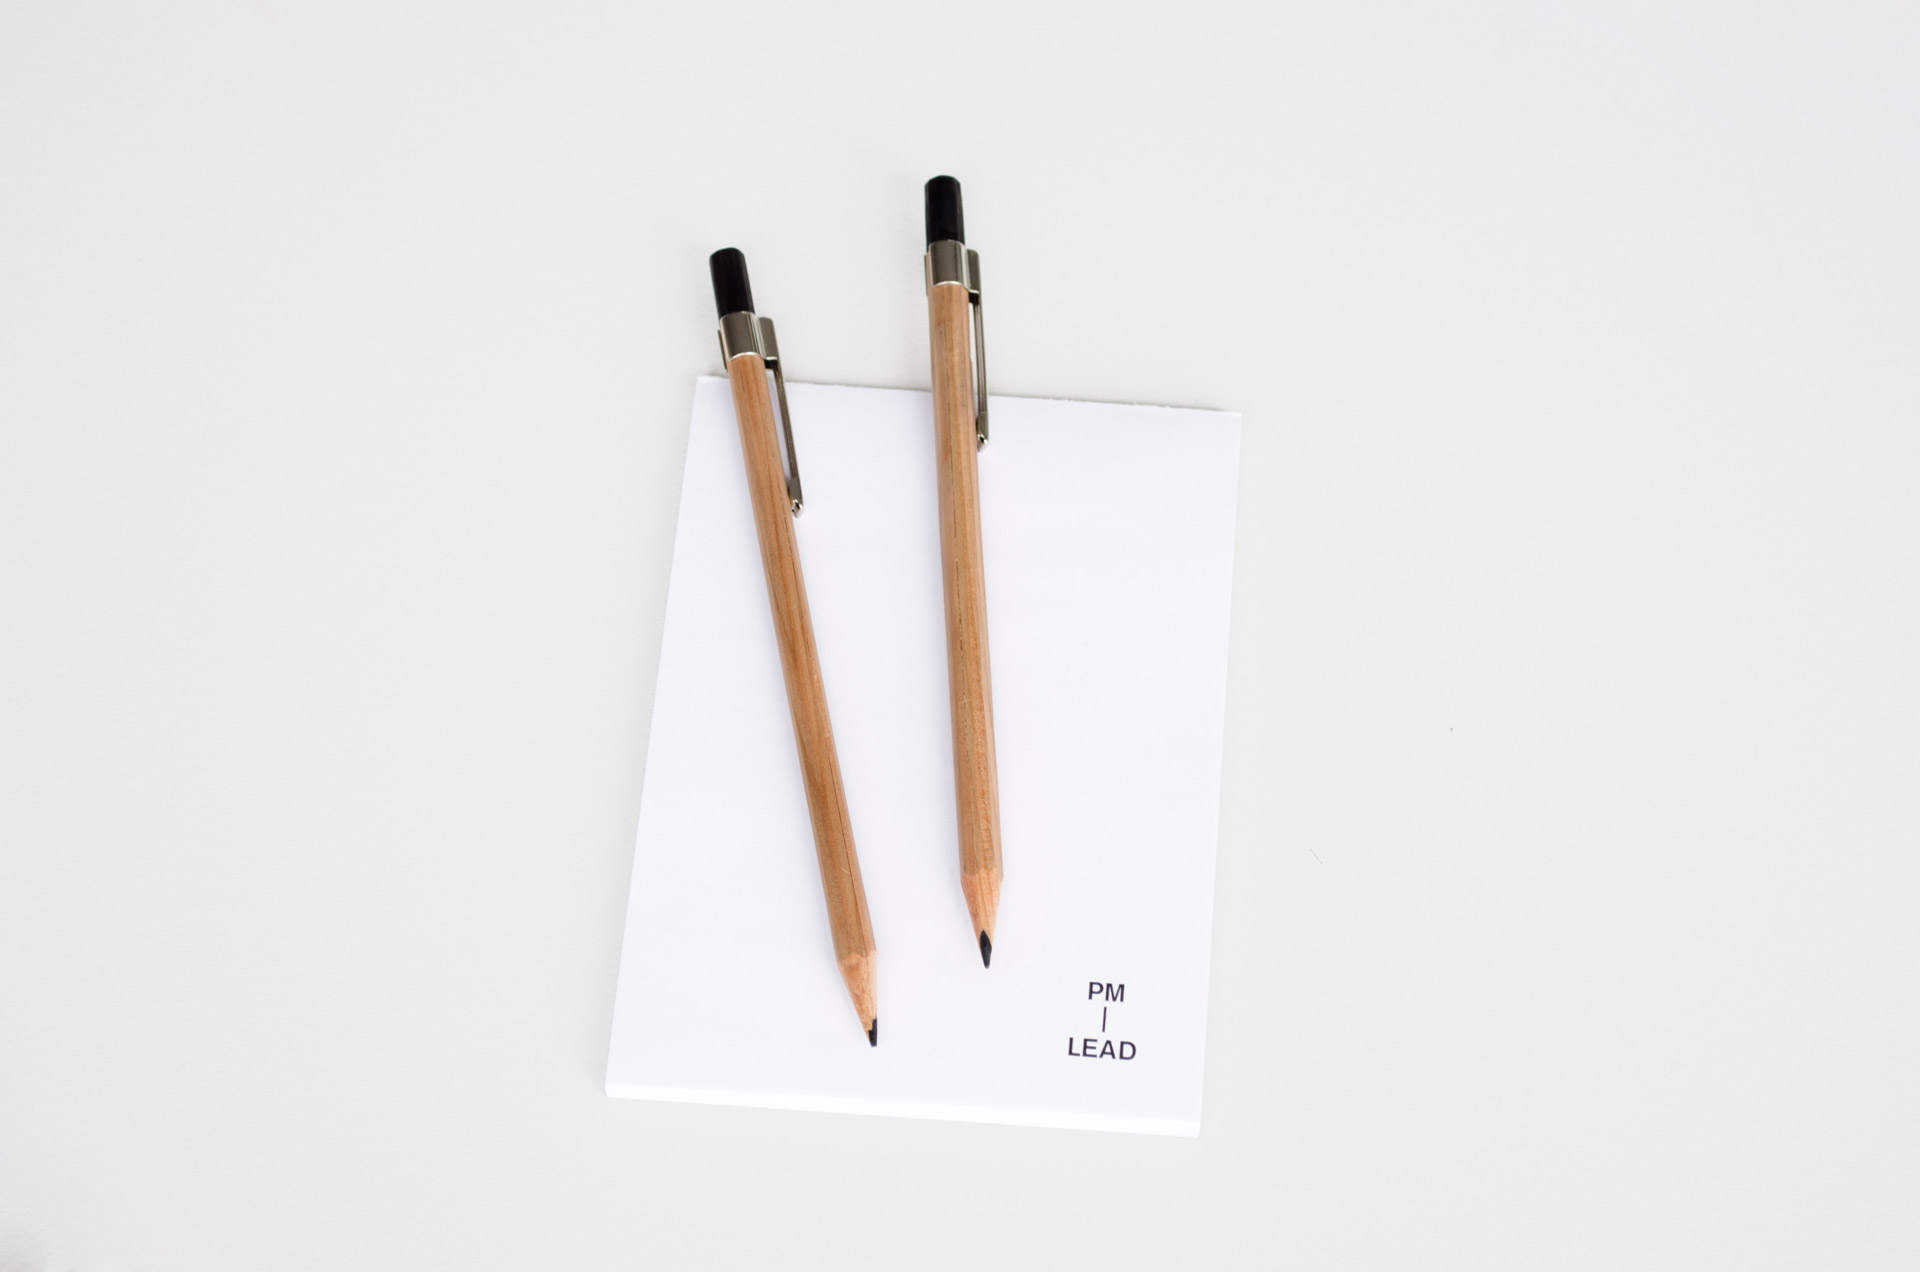 Tino Seubert - The Colour of Air - PM-LEAD Pencils